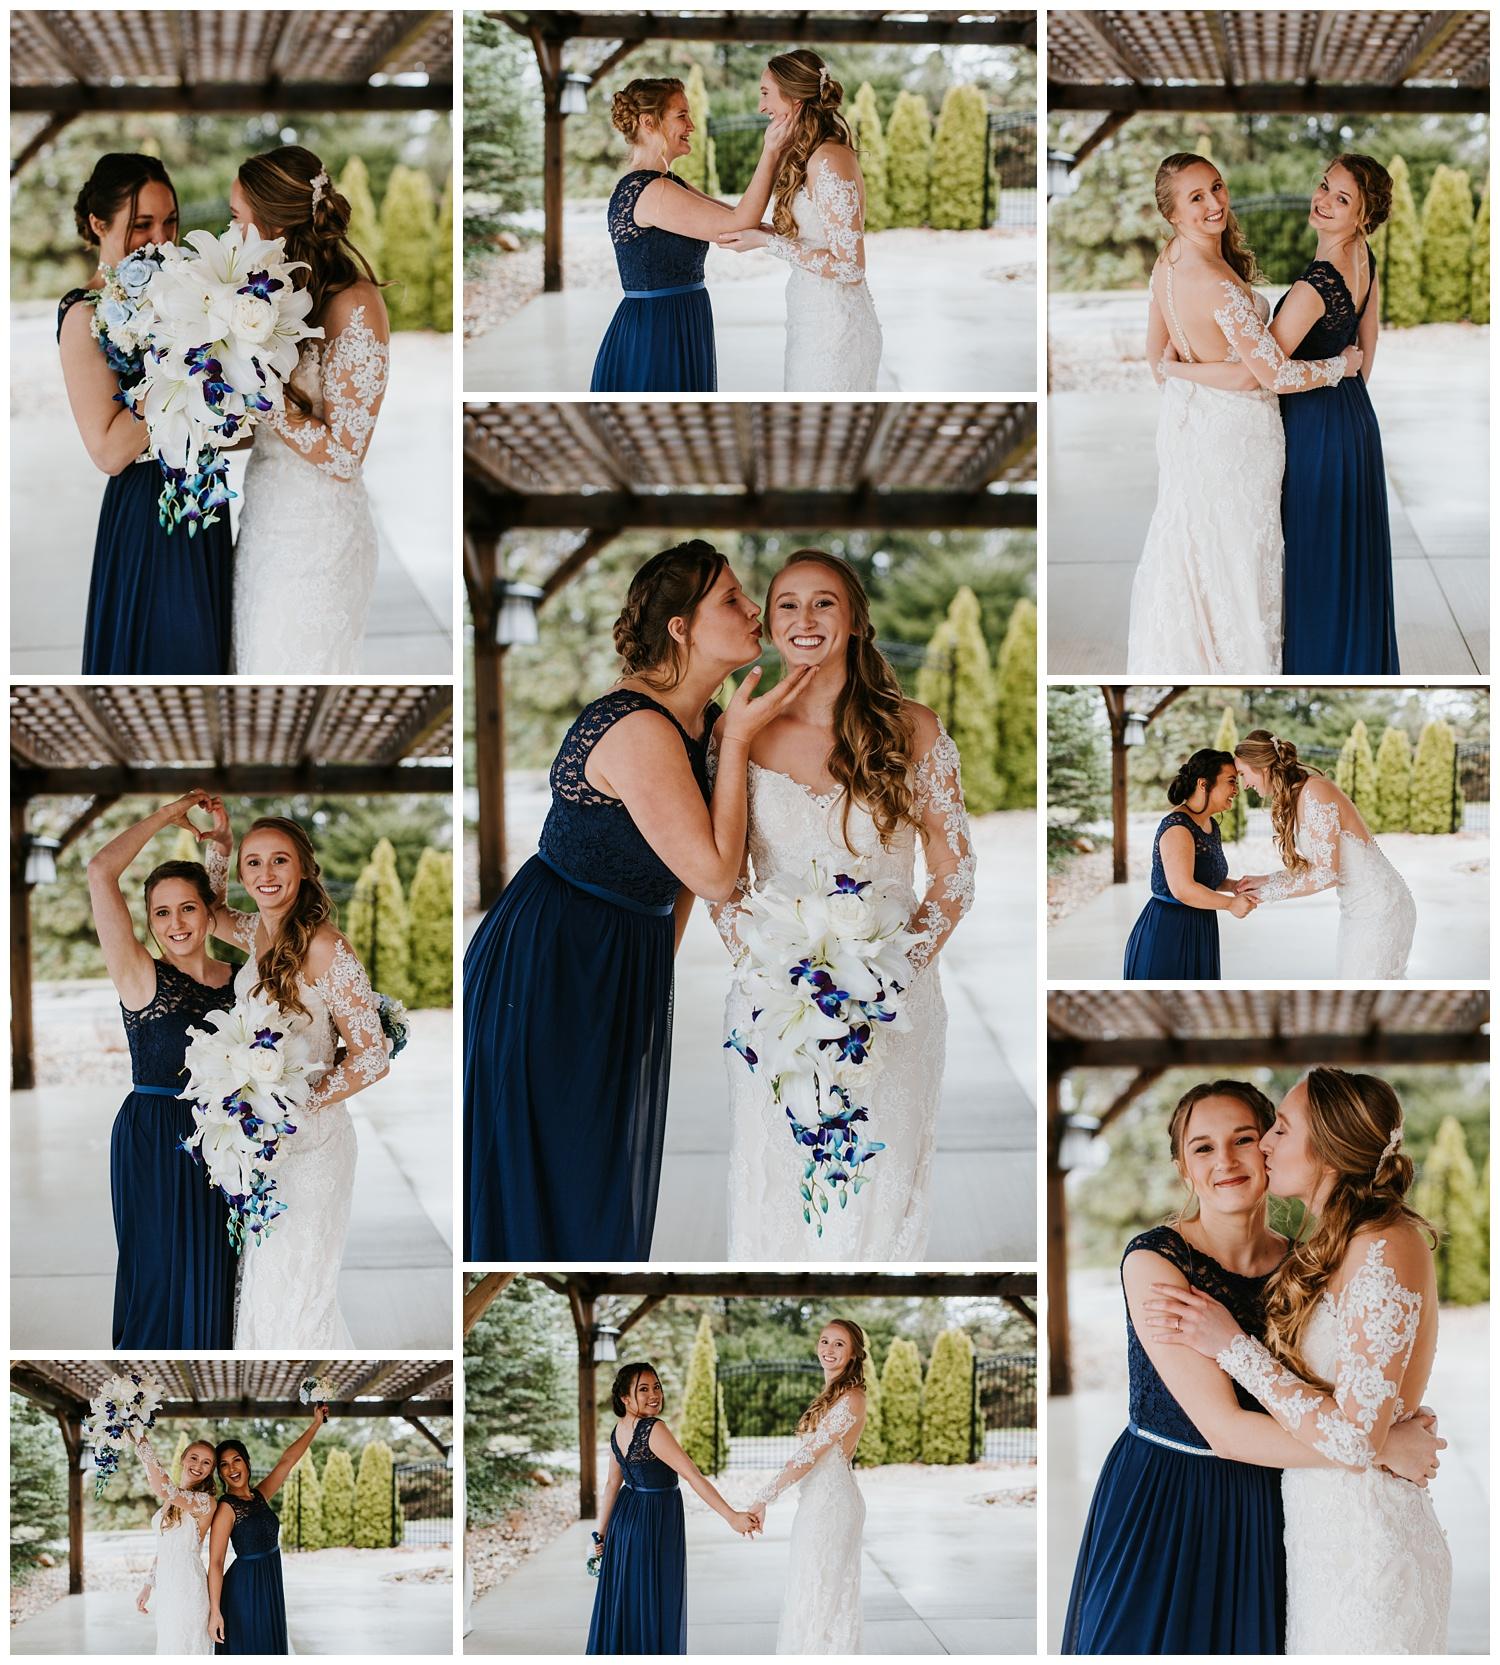 Shadowland Silver Beach St. Joseph Wedding Photographer Rainy Wedding15.jpg